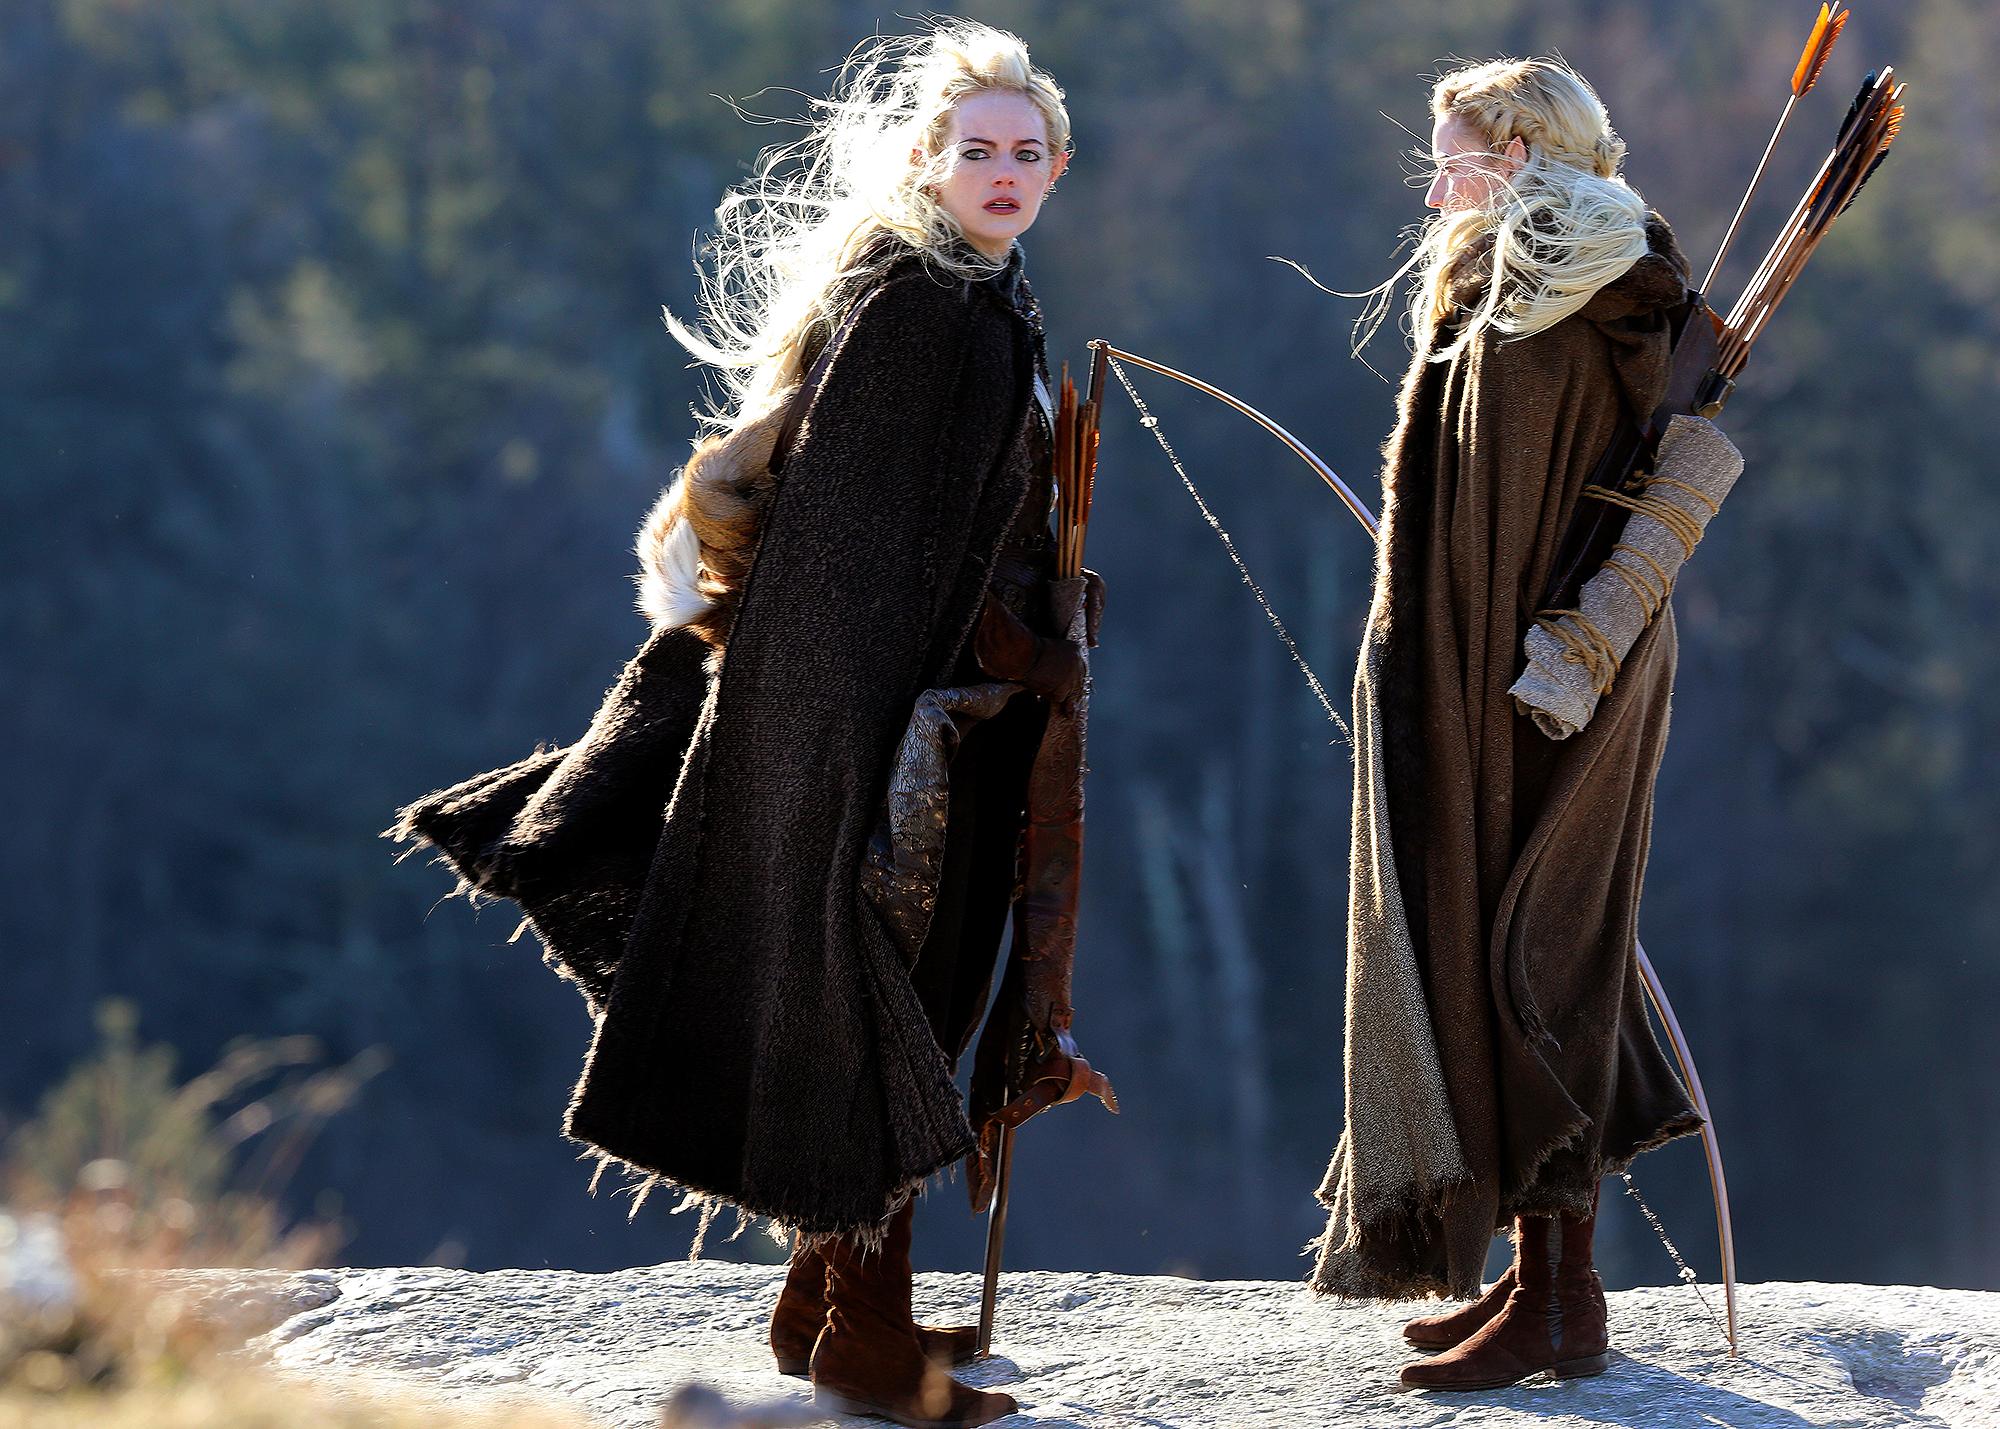 Emma e Julia Garner